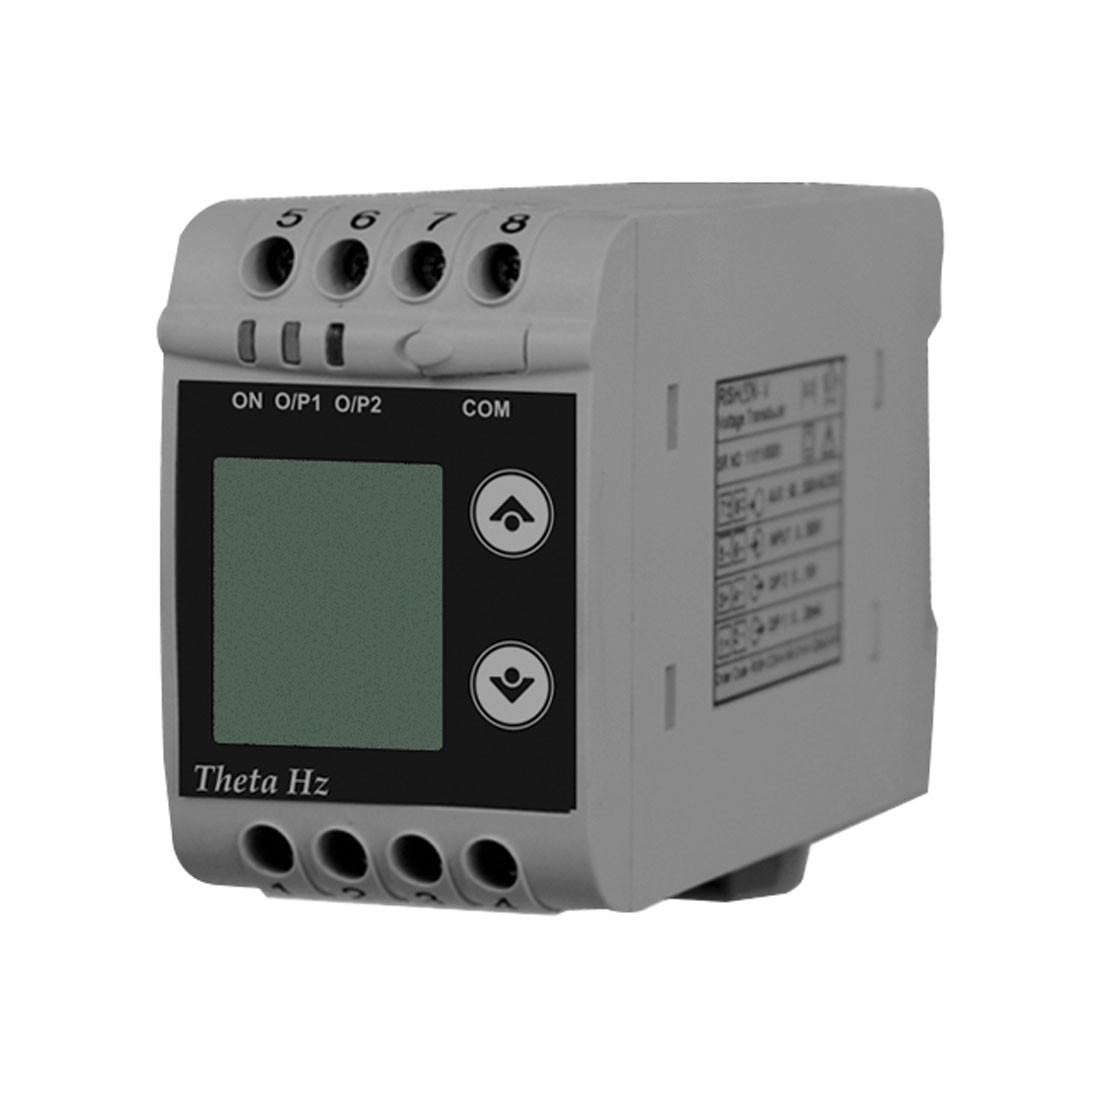 Theta Hz Frequency Transducer